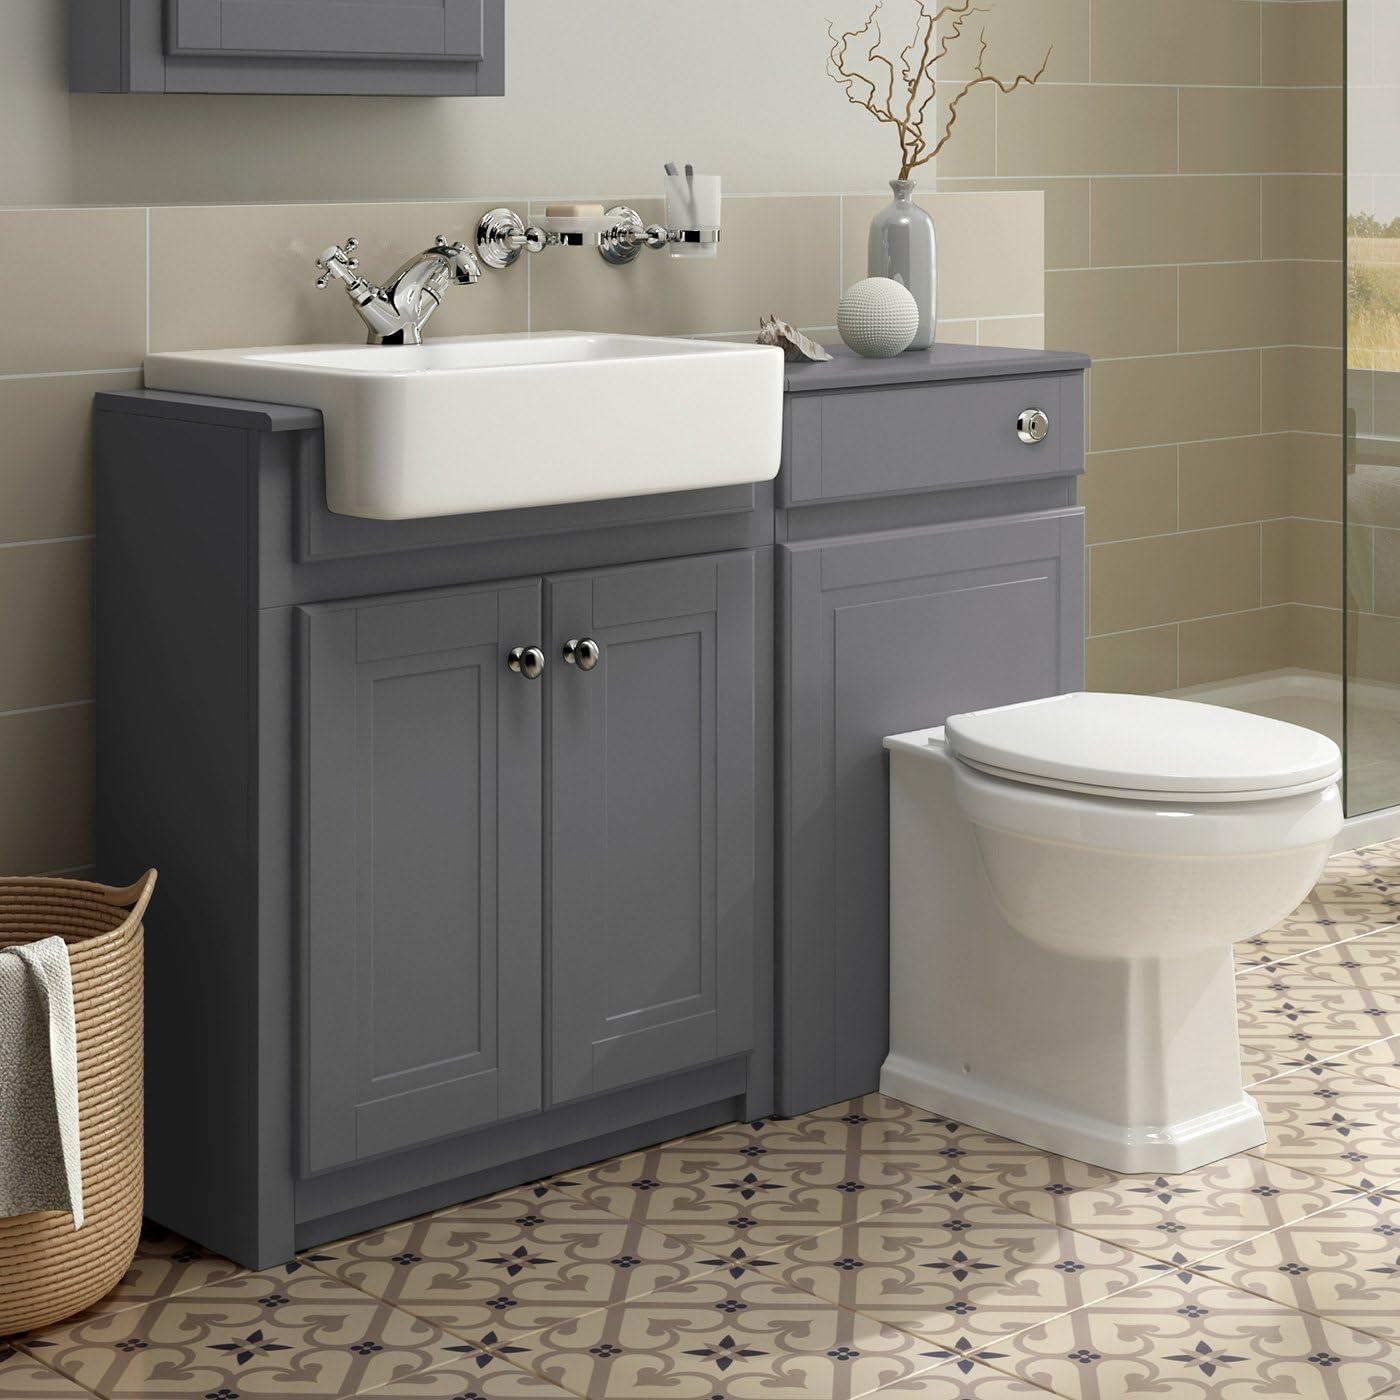 1100mm Combined Vanity Unit Toilet Basin Grey Bathroom Furniture Storage Sink Ibathuk Amazon Co Uk Home Kitchen